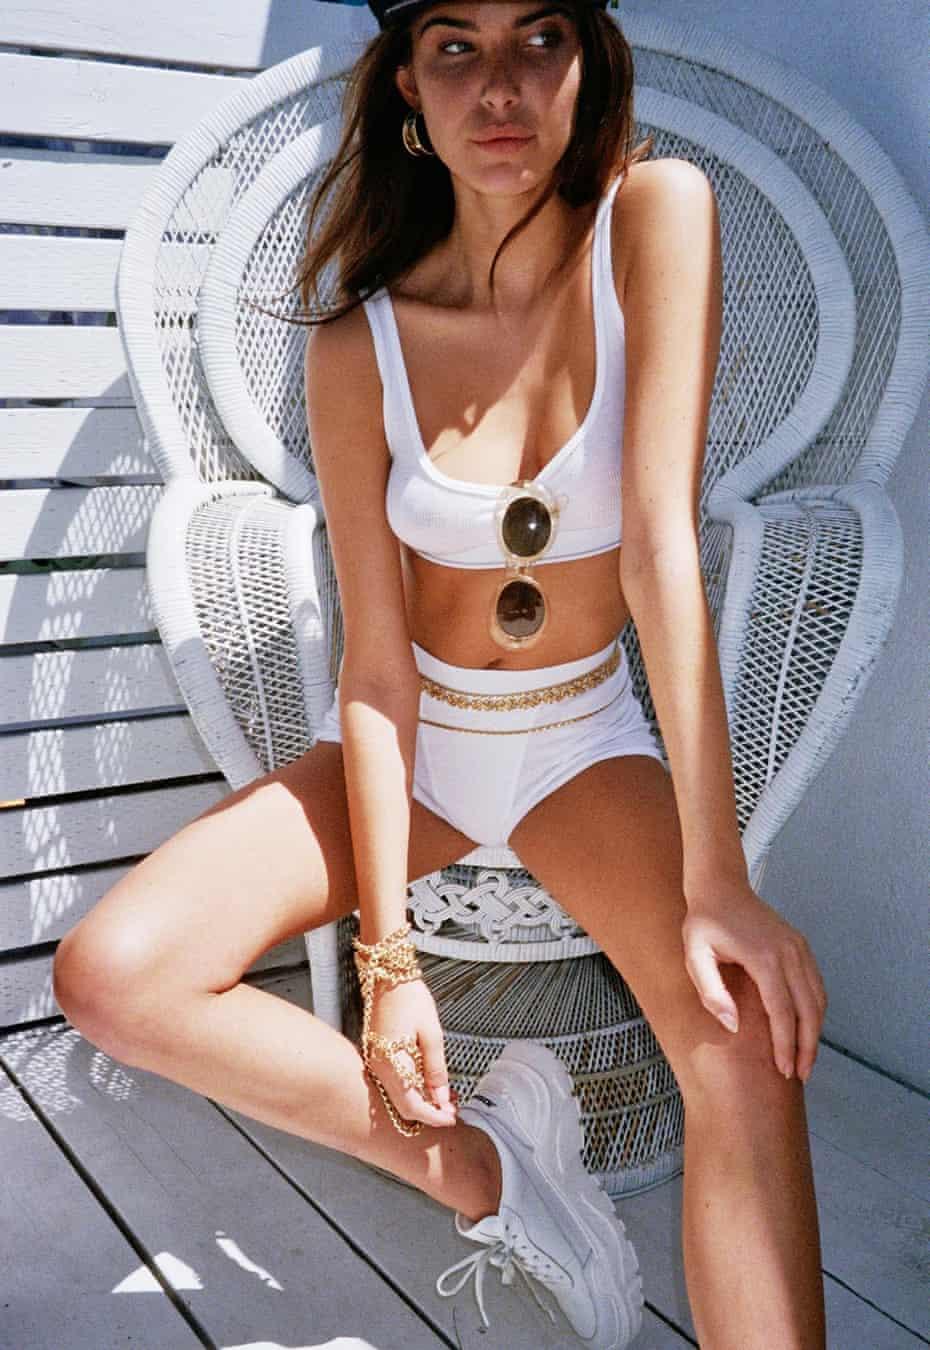 Charlotte D'Alessio in a white bikini.